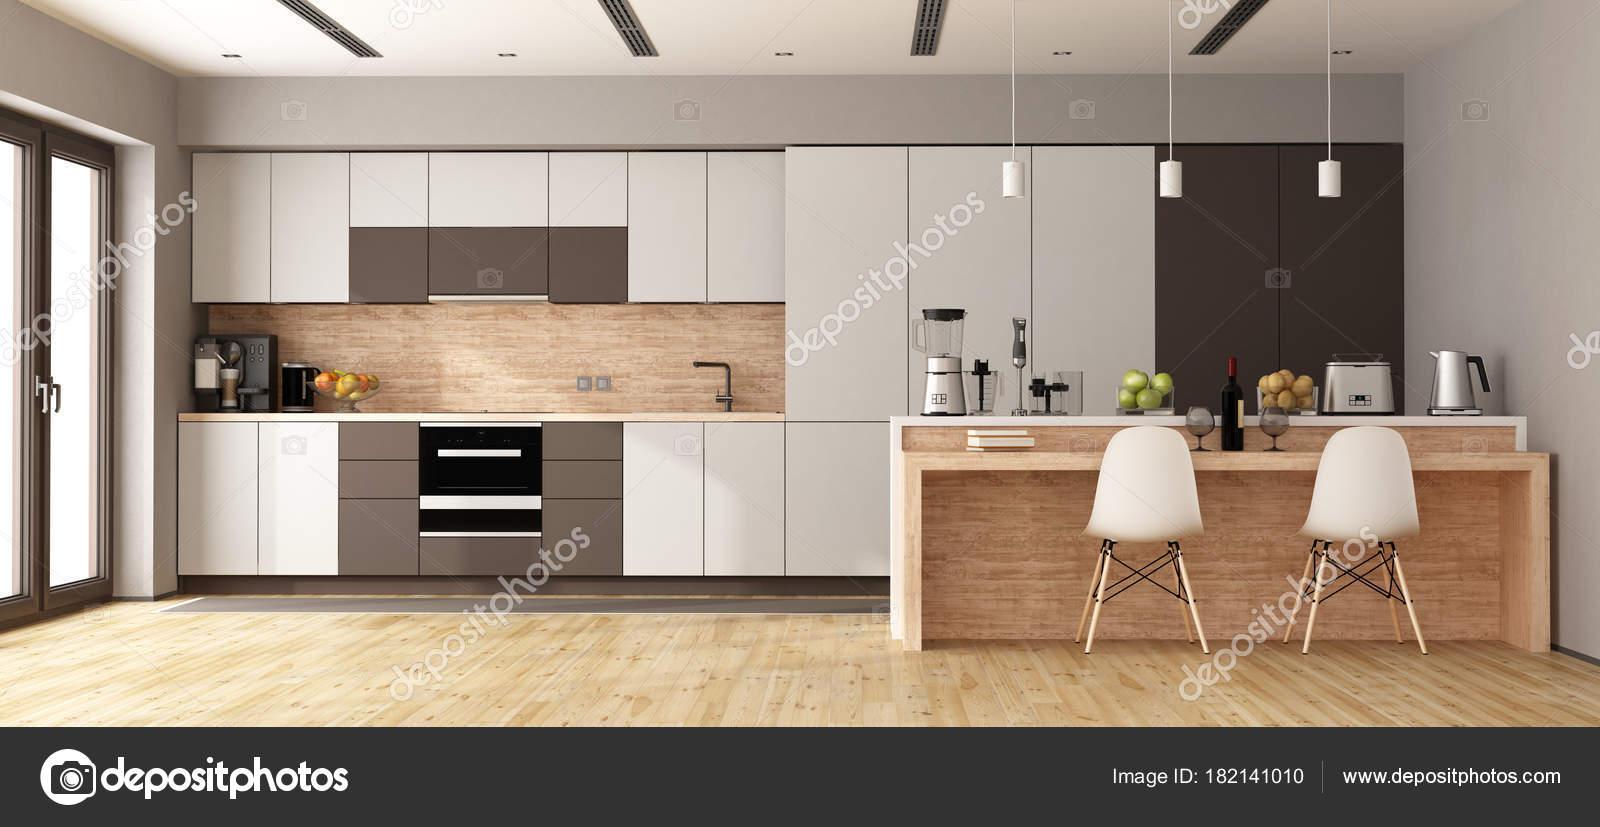 Cucina moderna bianca e marrone — Foto Stock © archideaphoto #182141010